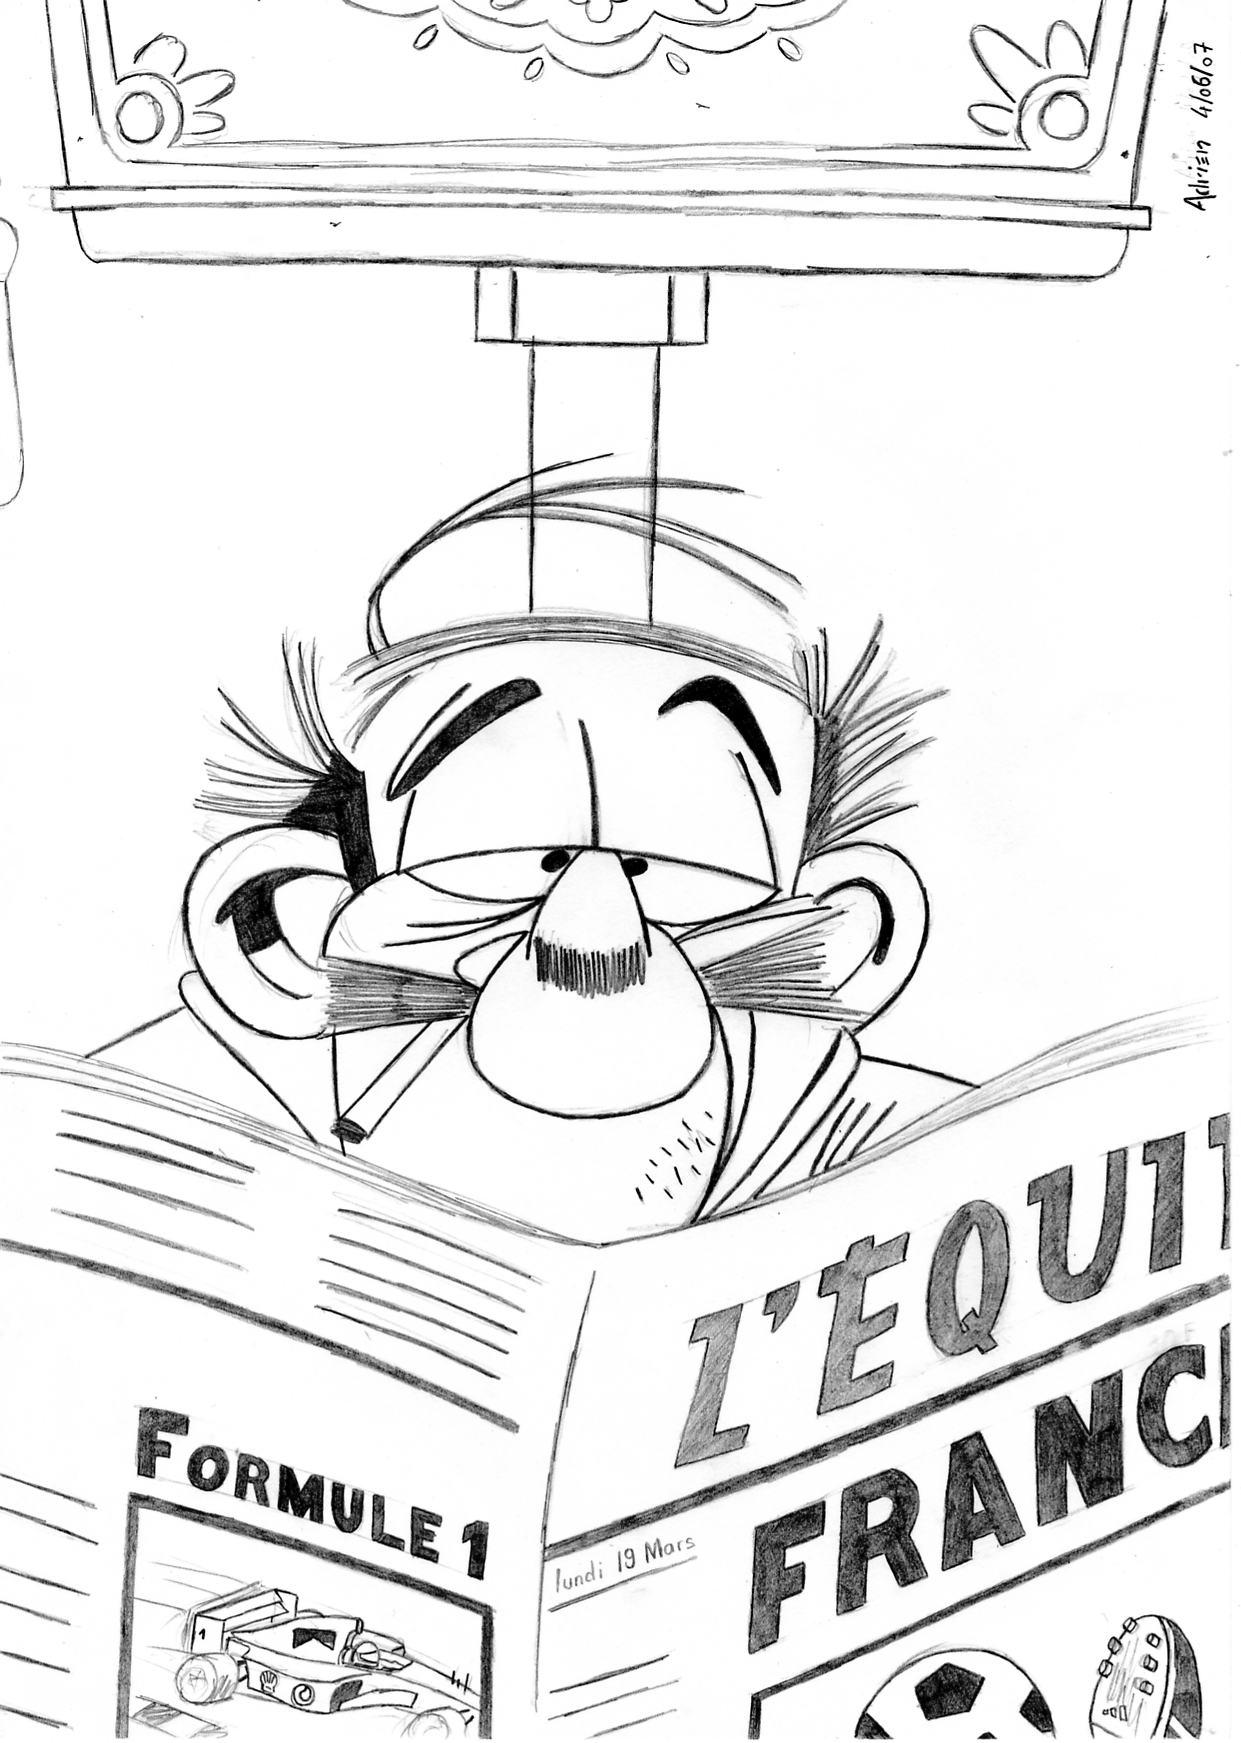 Dessin Le petit Spirou 2 de Adrien72140